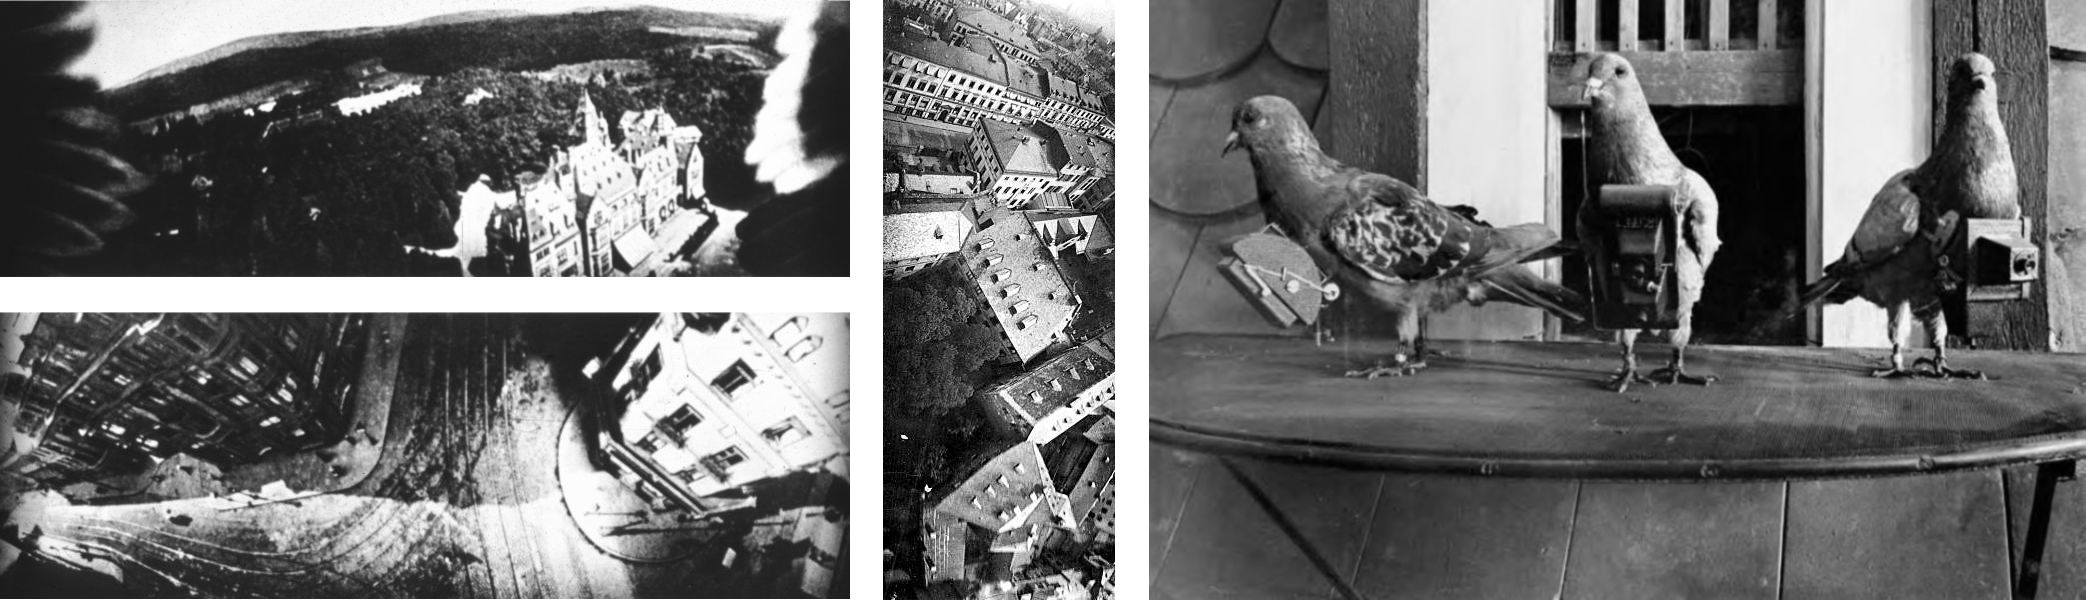 Neubronner's pigeons.